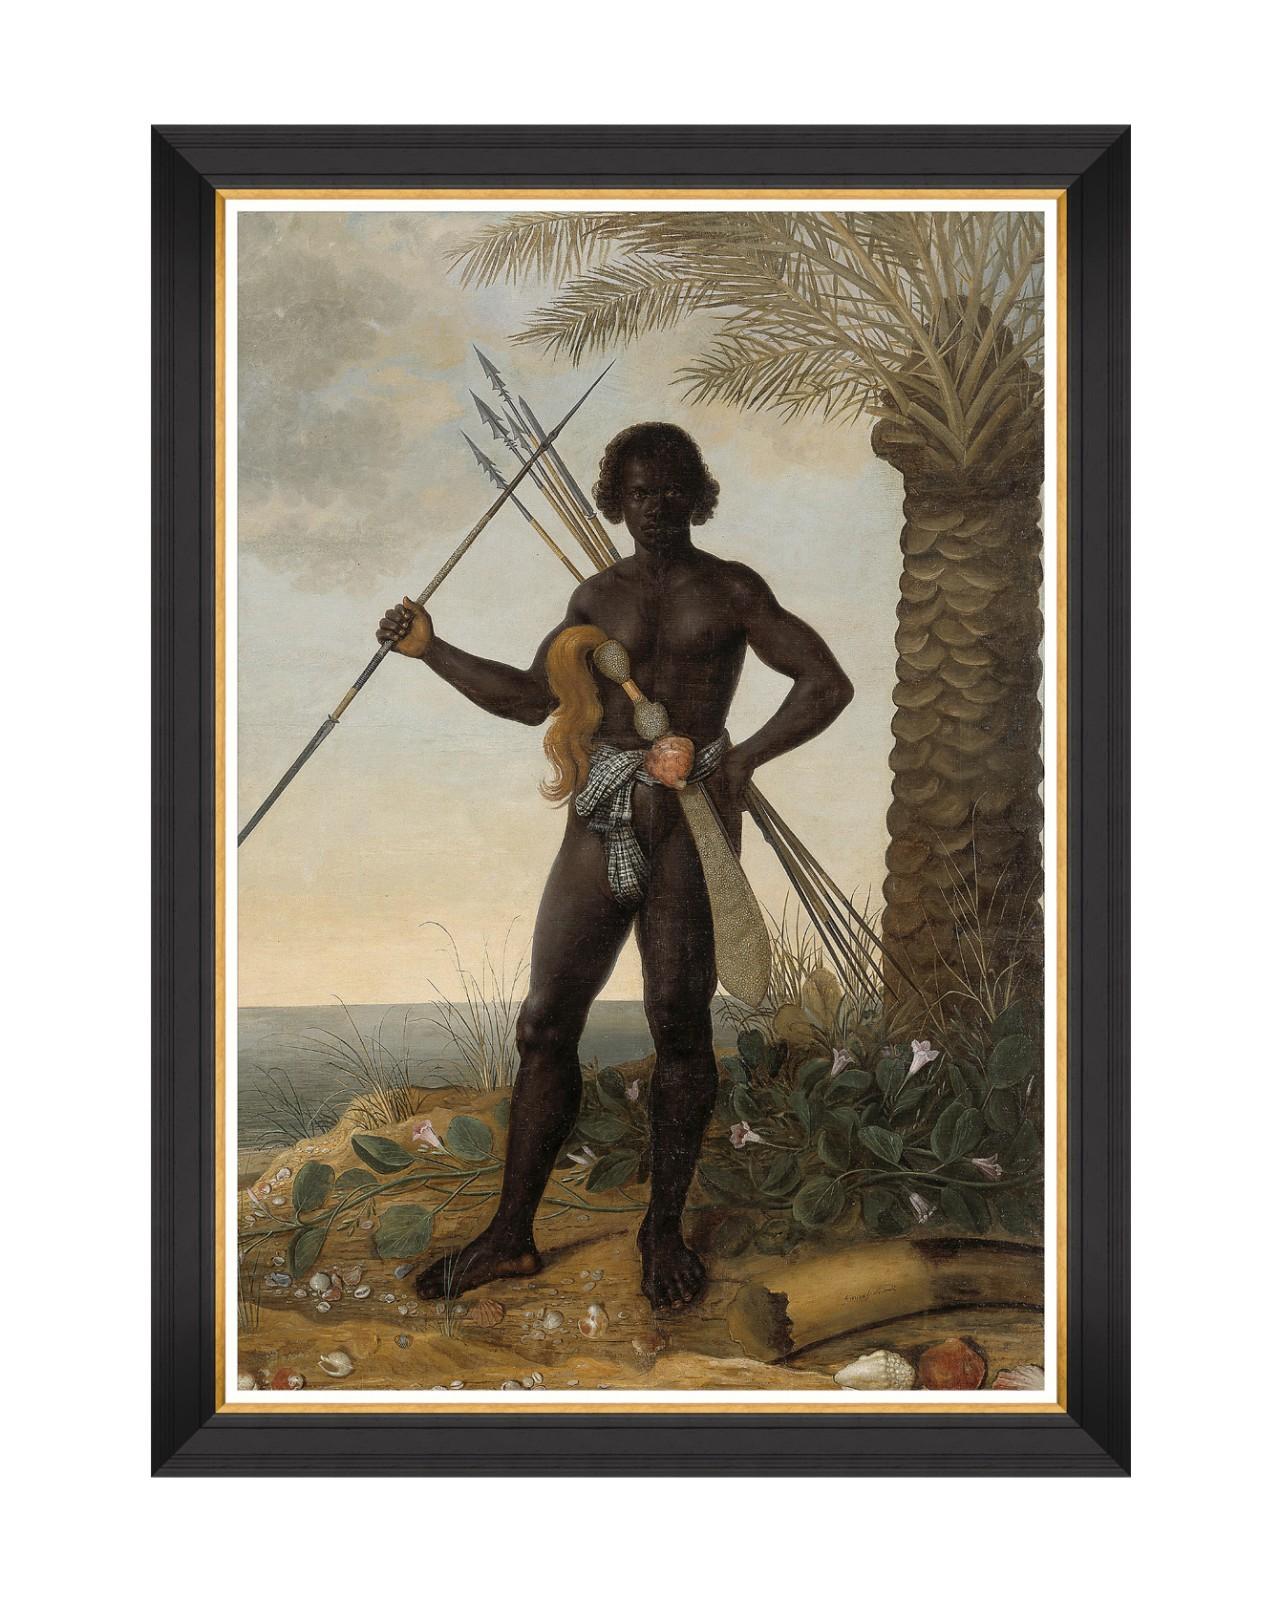 AFRICAN MAN BY ECKHOUT Framed Art